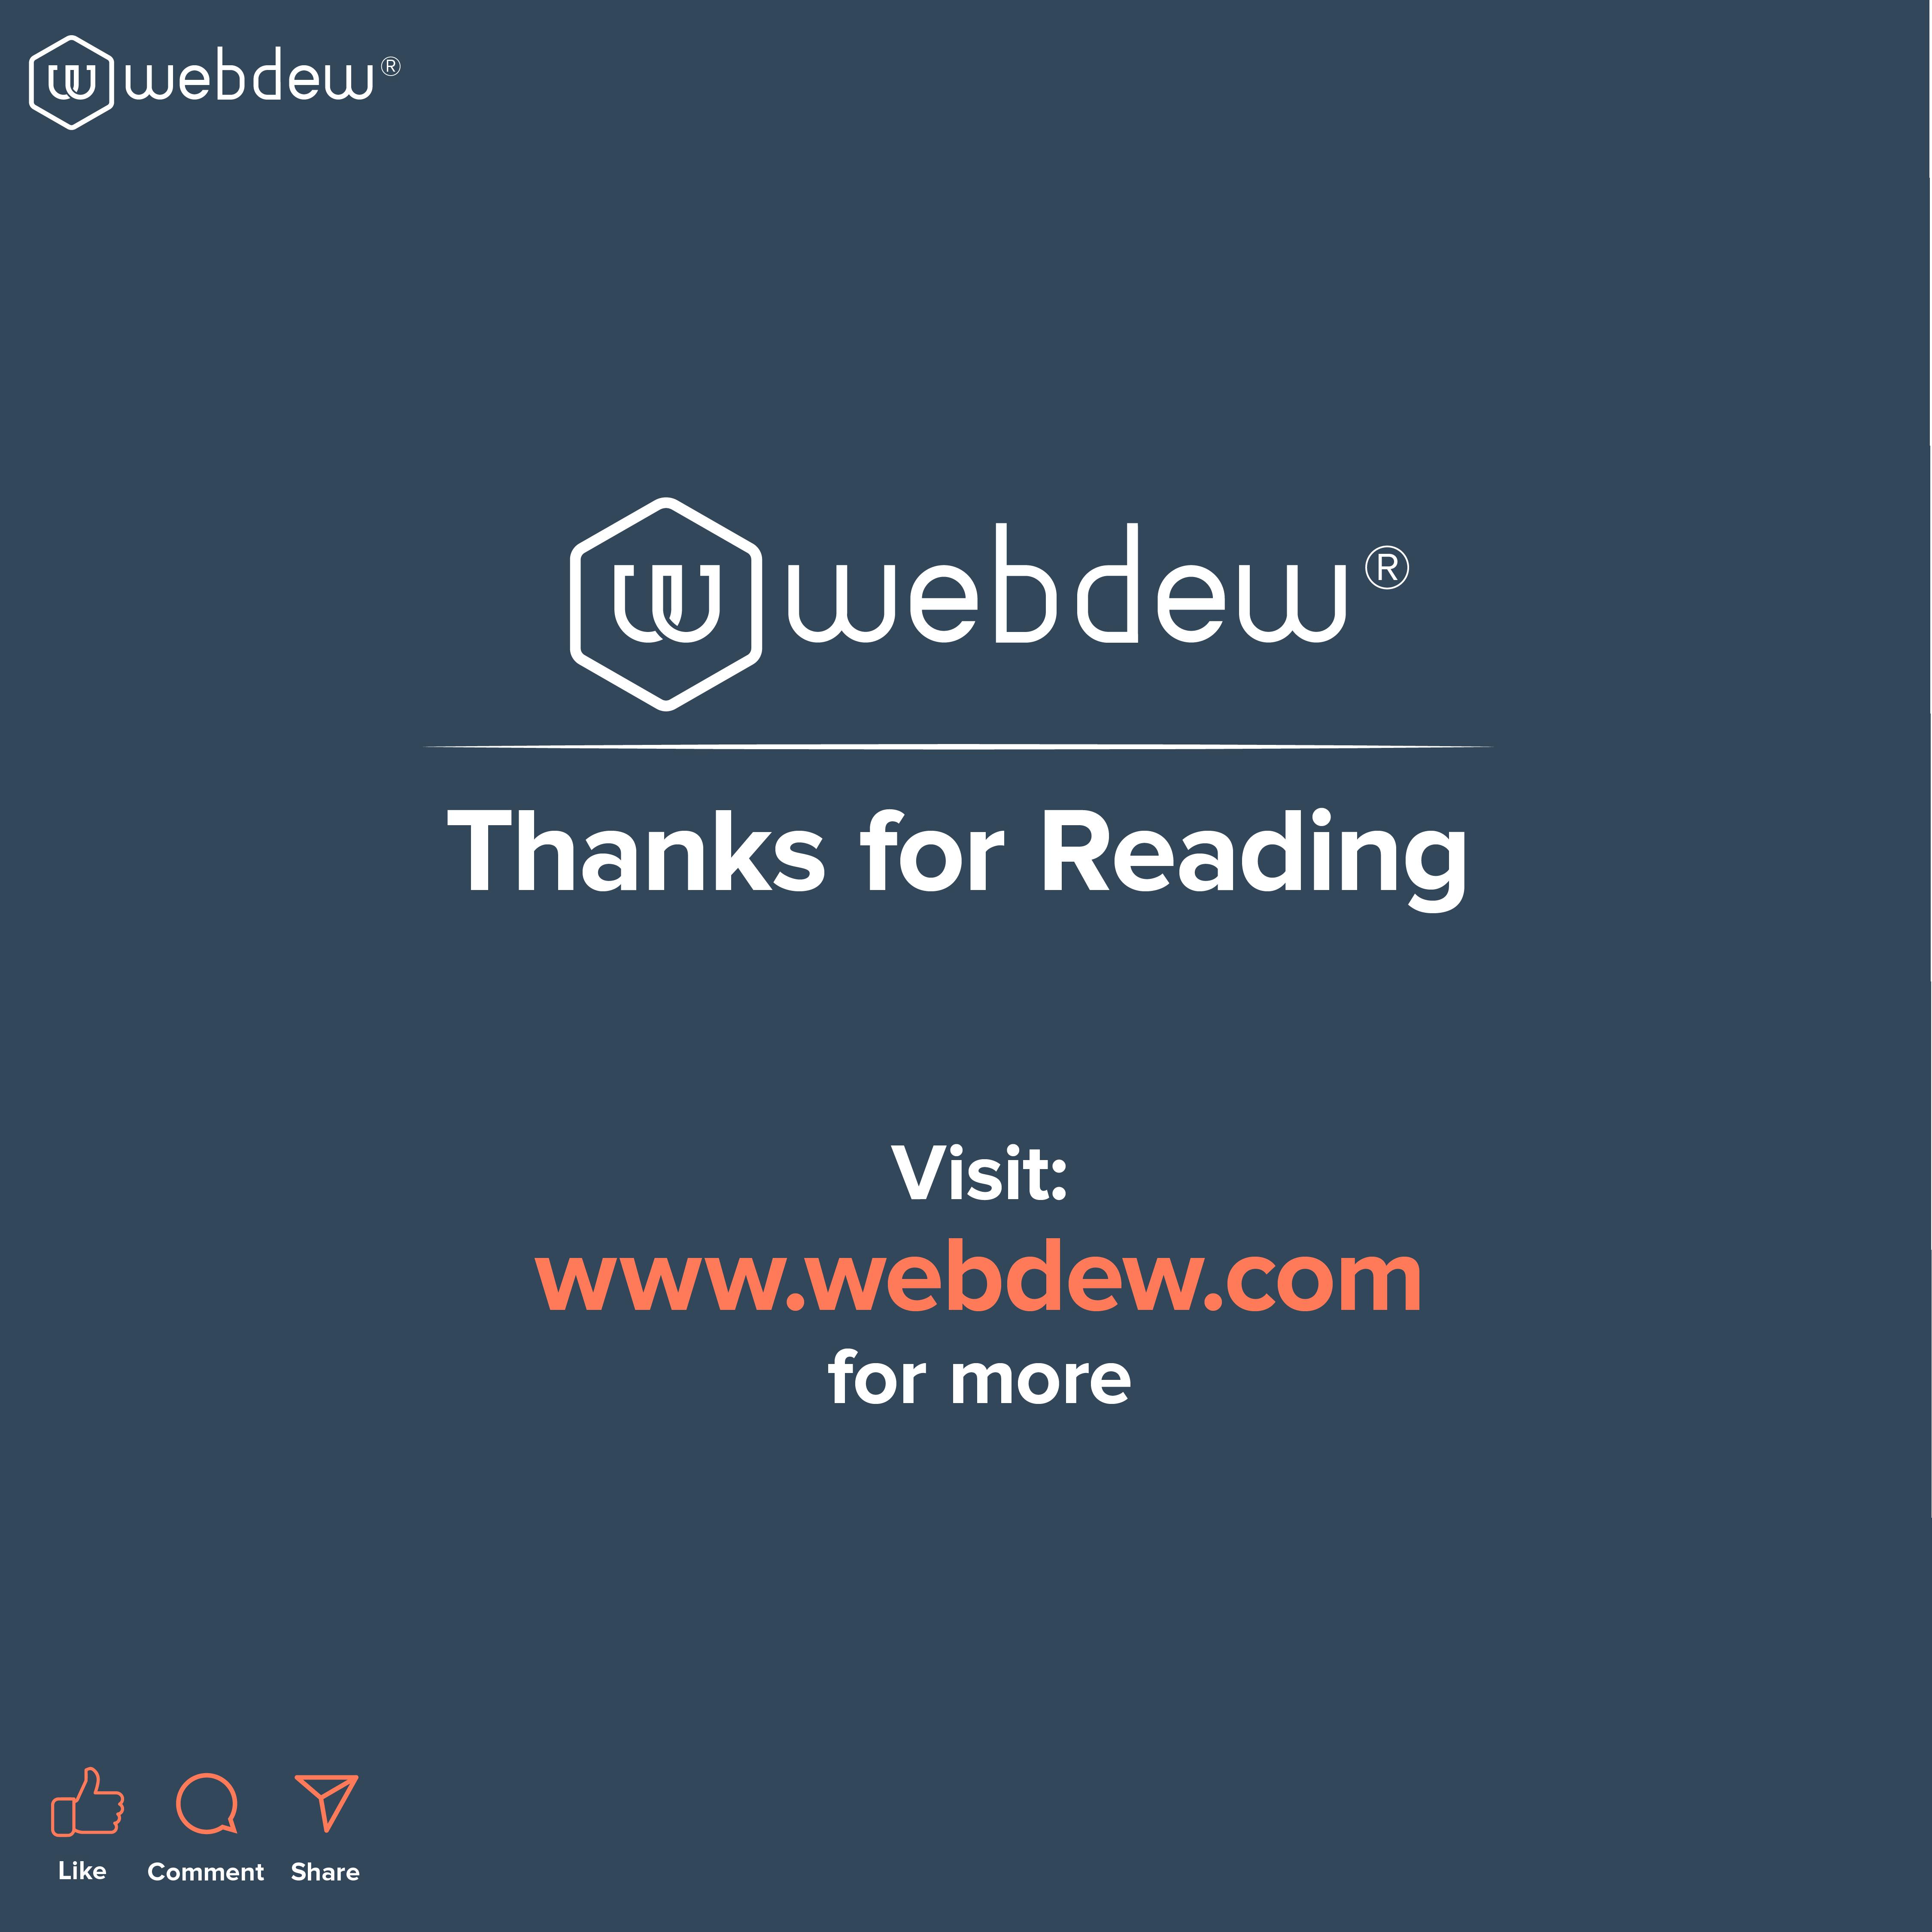 6. thanks for reading-4